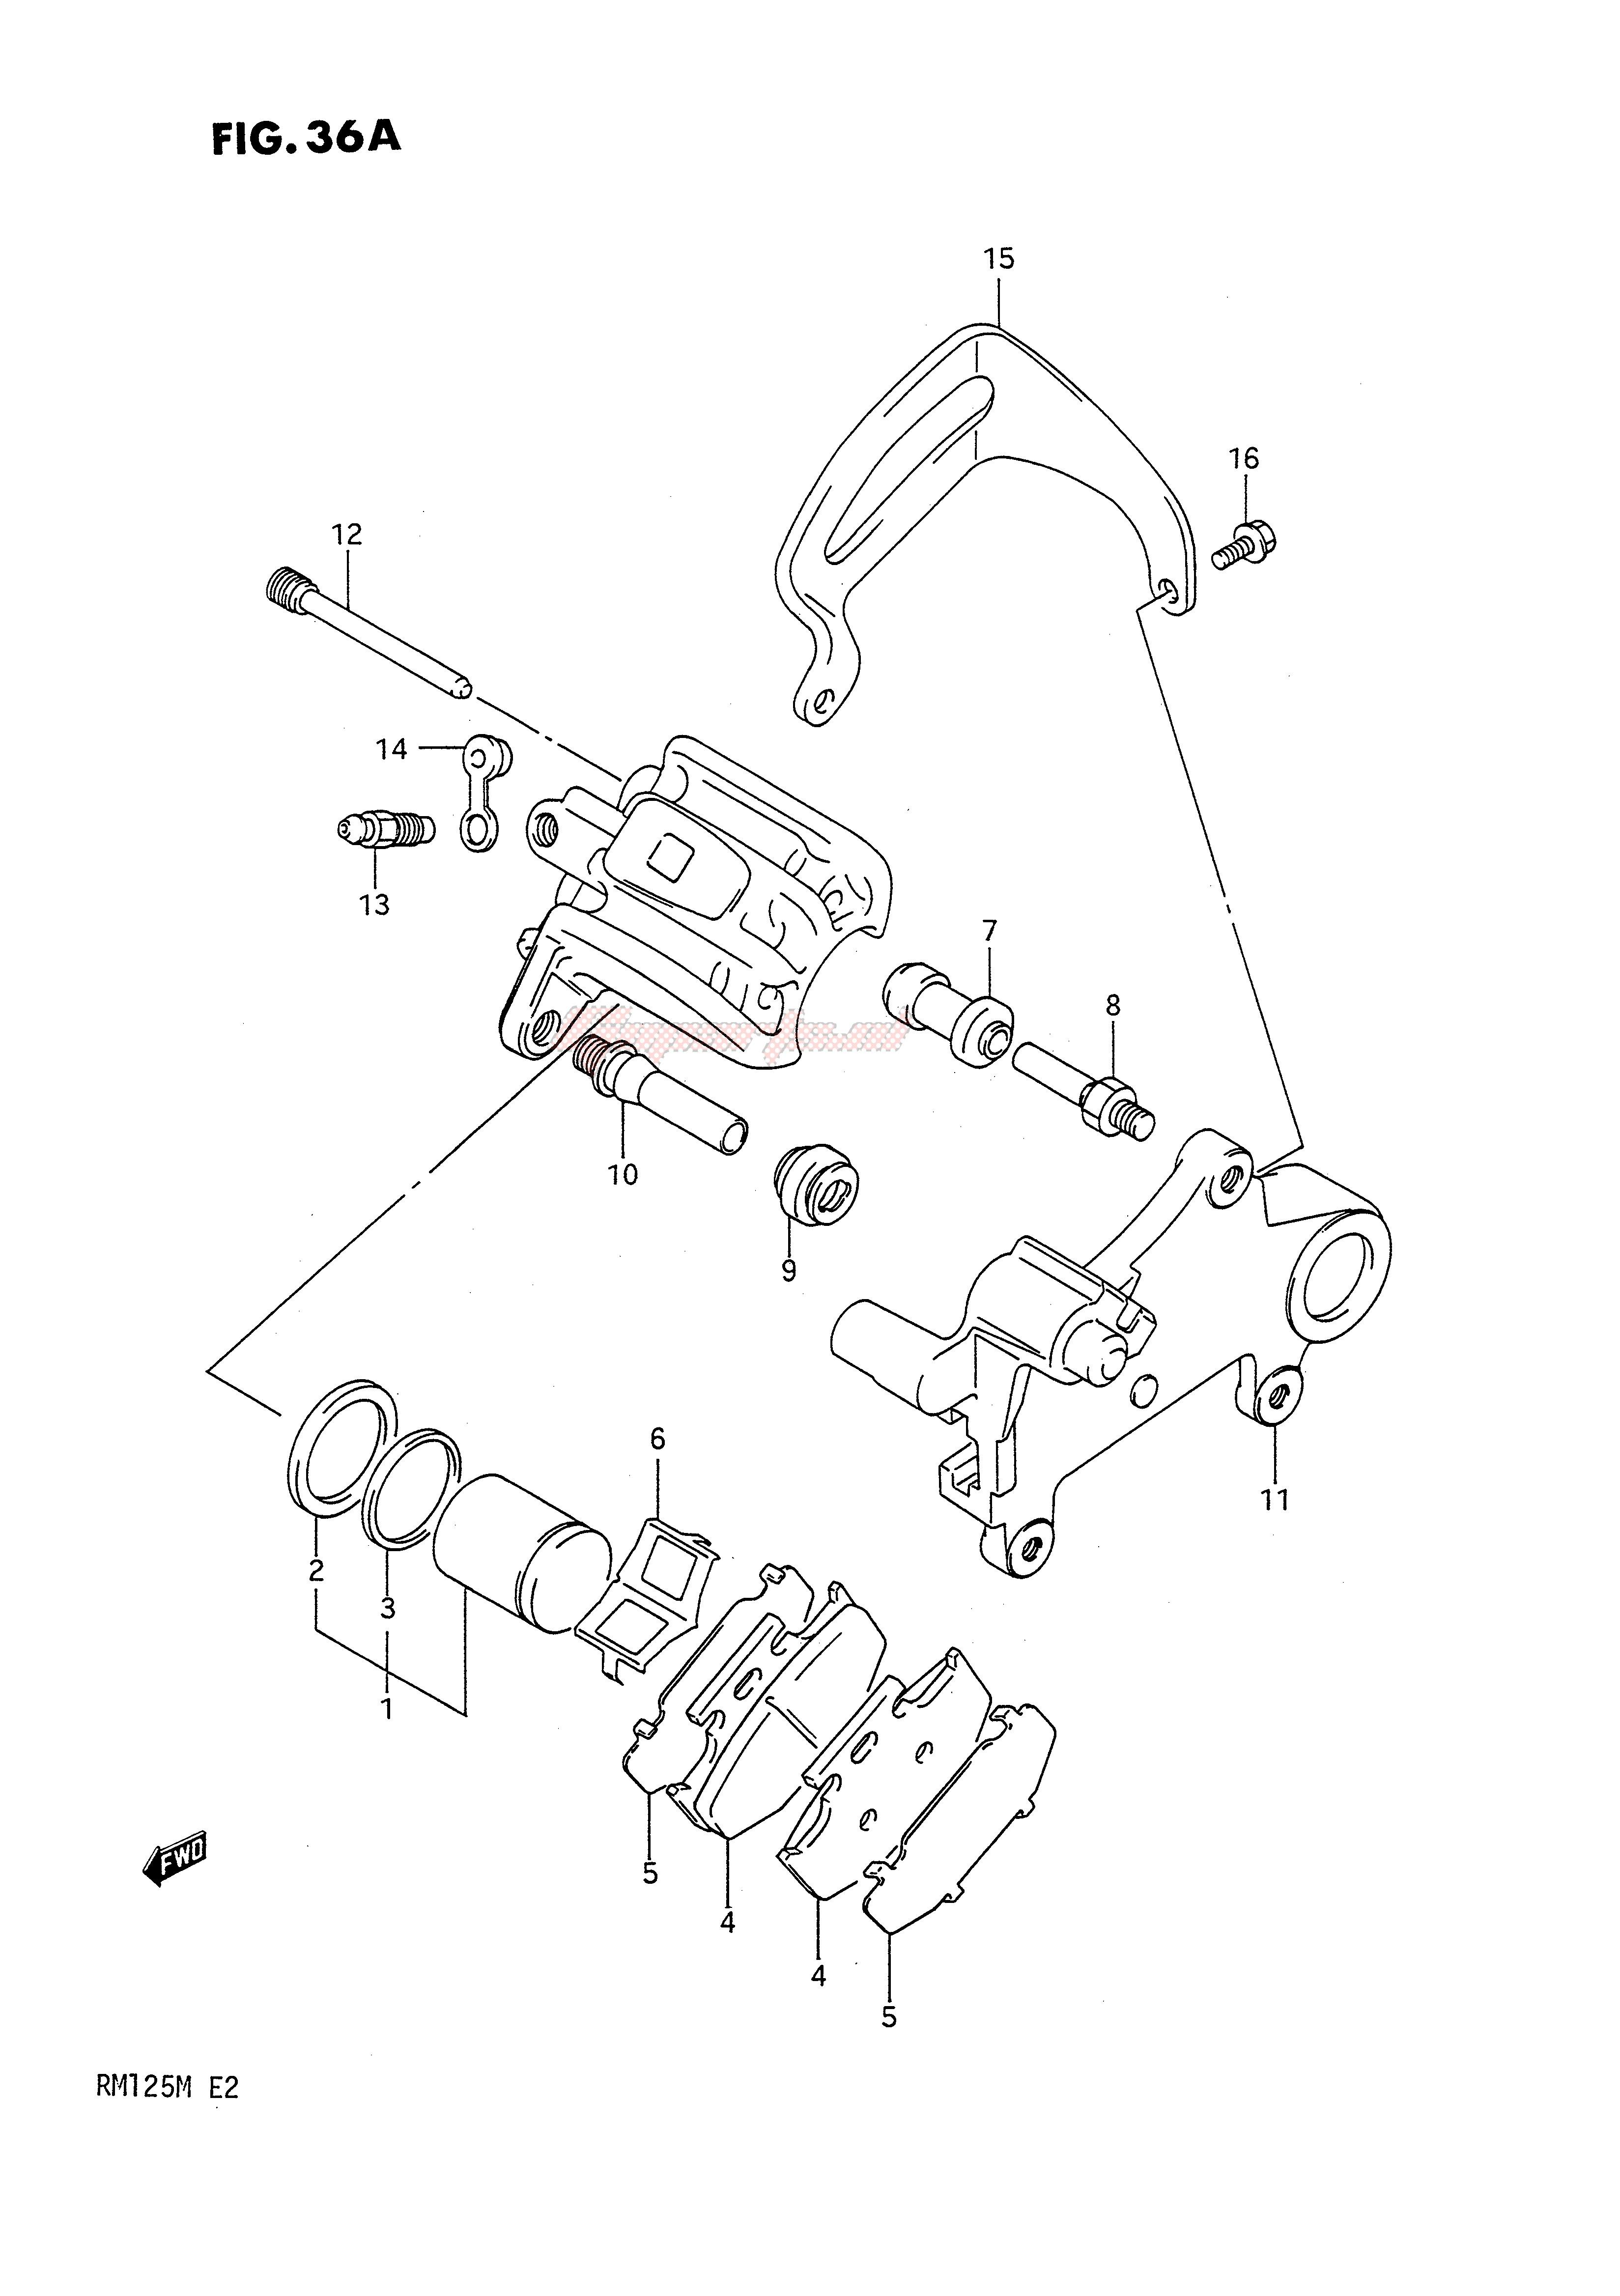 REAR CALIPERS (MODEL L) blueprint